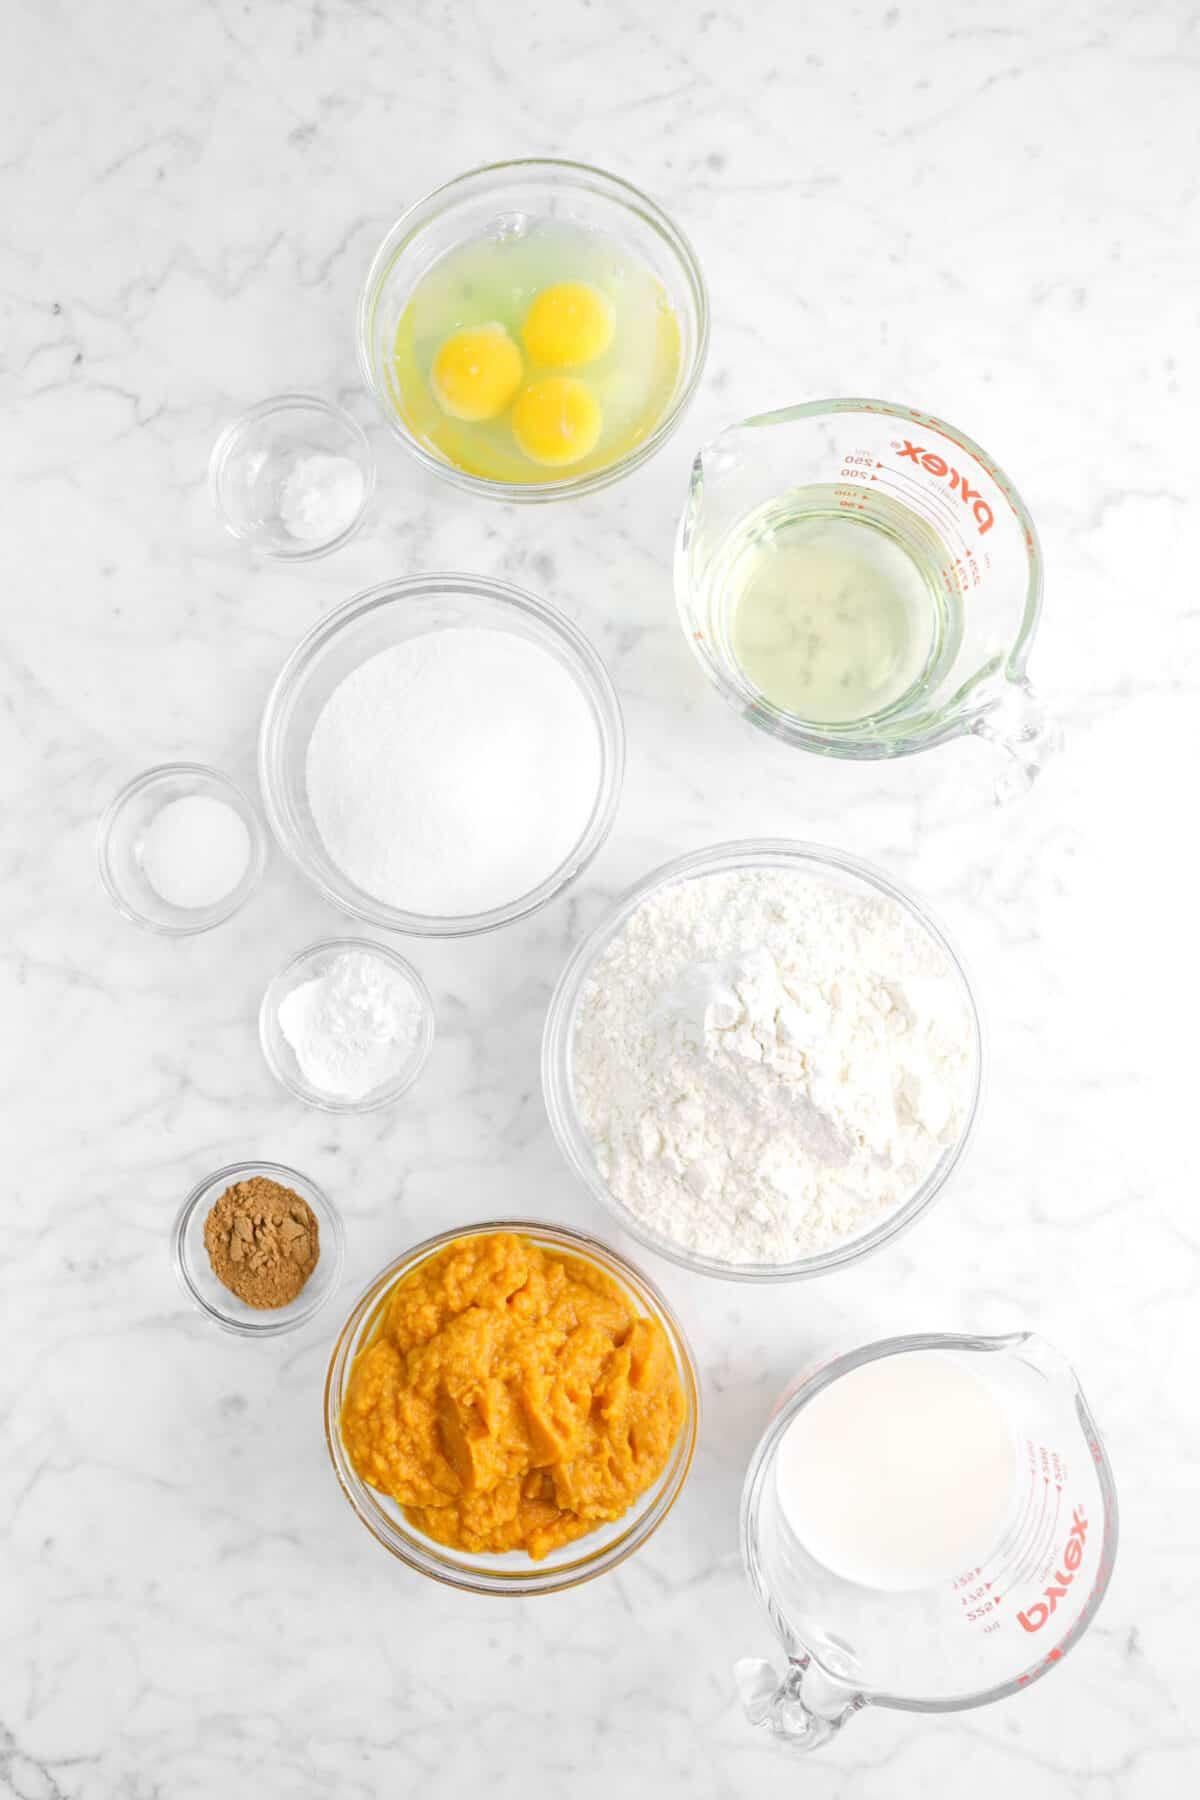 eggs, baking powder, vegetable oil, sugar, salt, baking soda, flour, pumpkin pie spice, vegetable oil, milk in bowls on marble counter